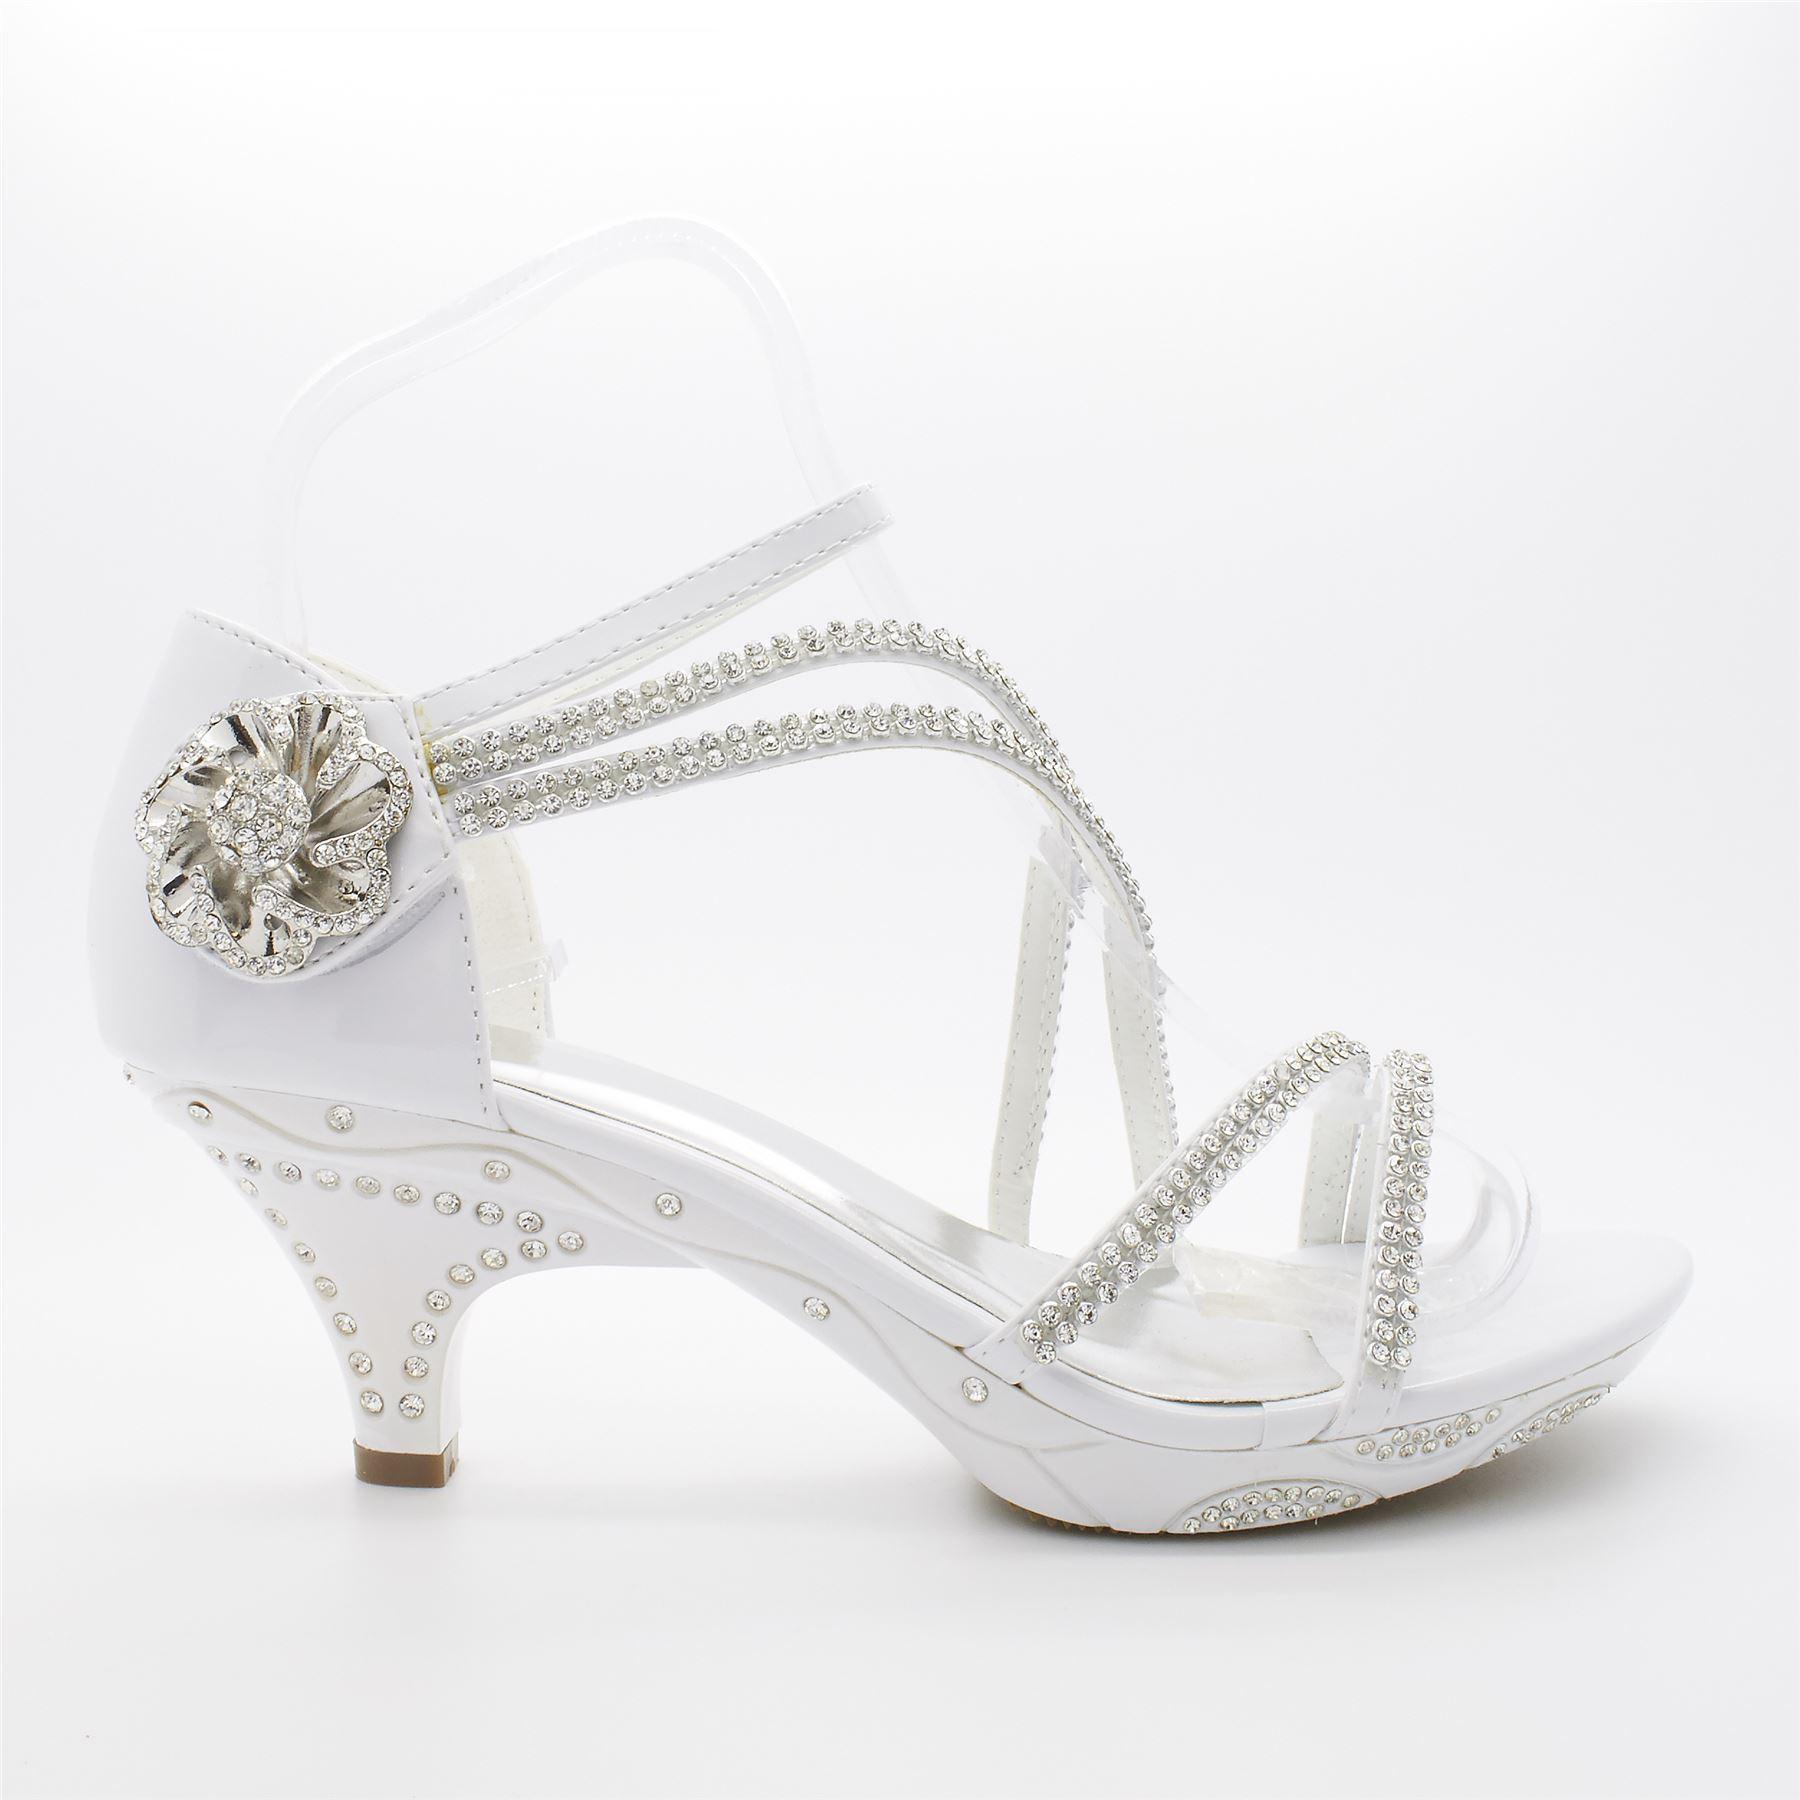 Wedding Kitten Heels: Bridal Shoes Size Womens Ladies Diamante Wedding Low